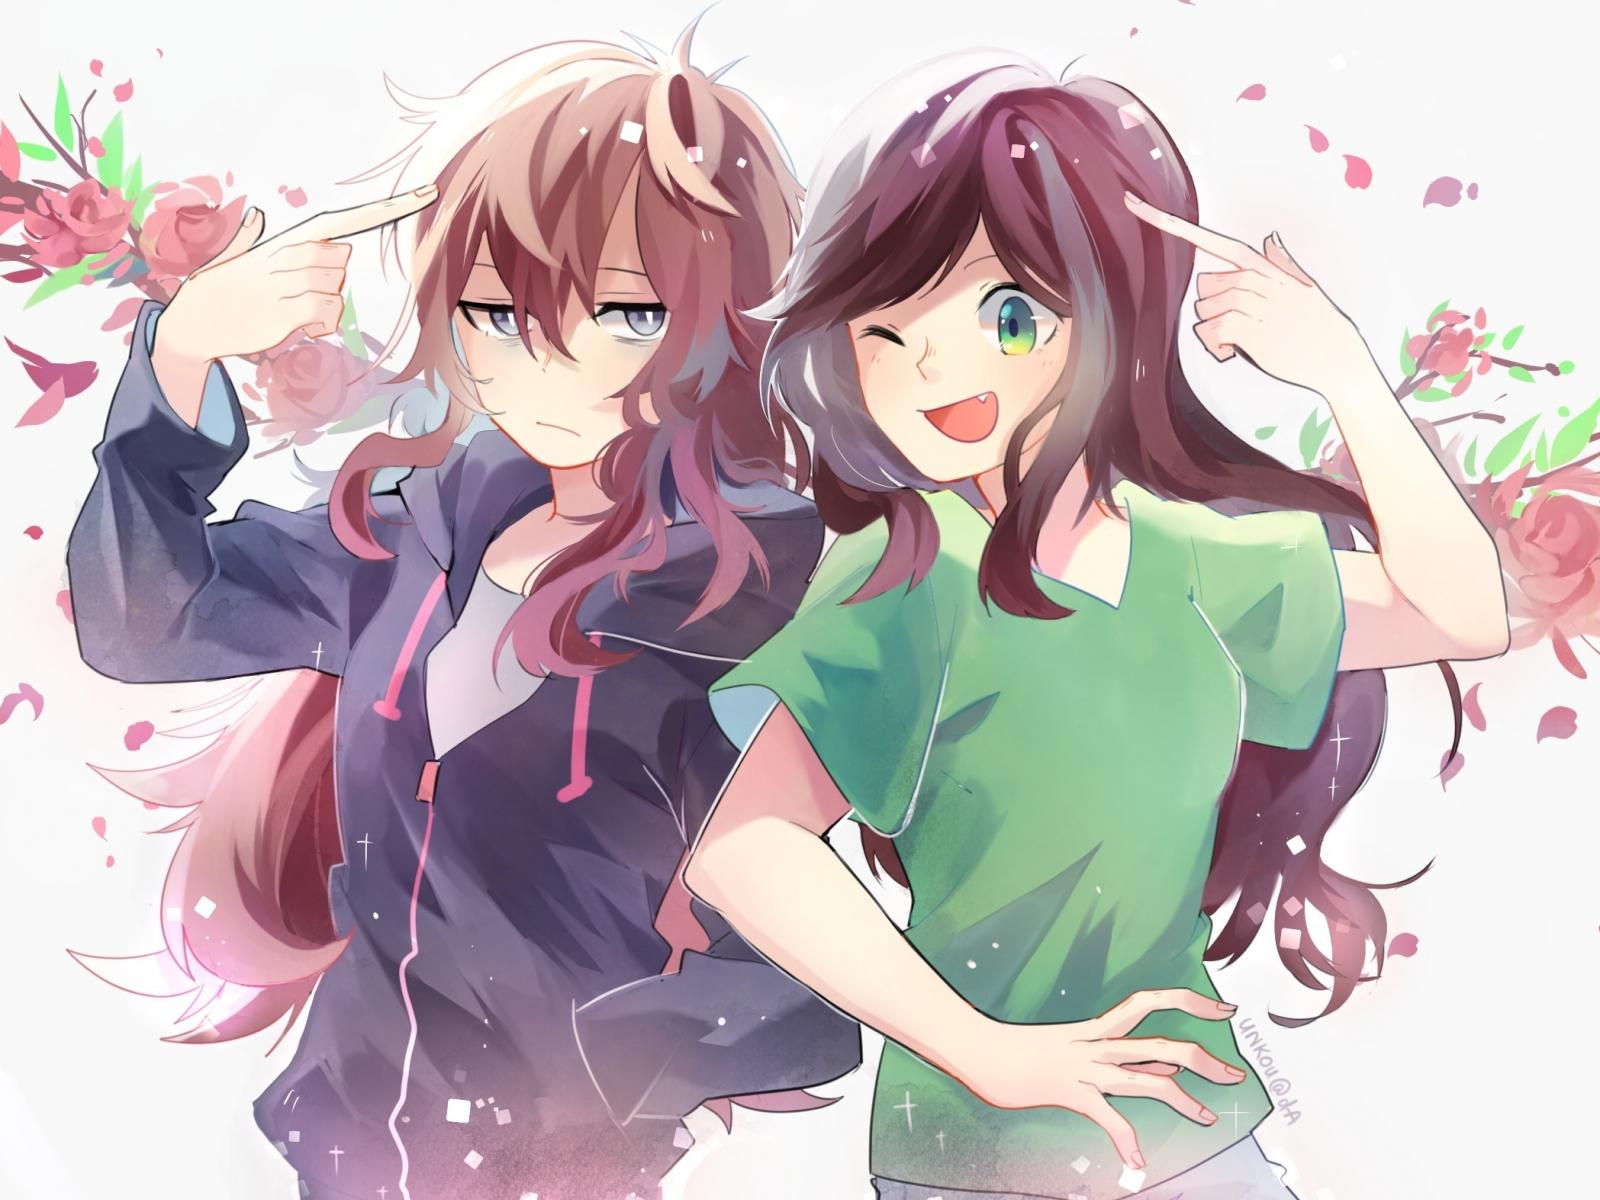 download 1600x1200 wallpaper two crazy girls, fun, anime, standard 4